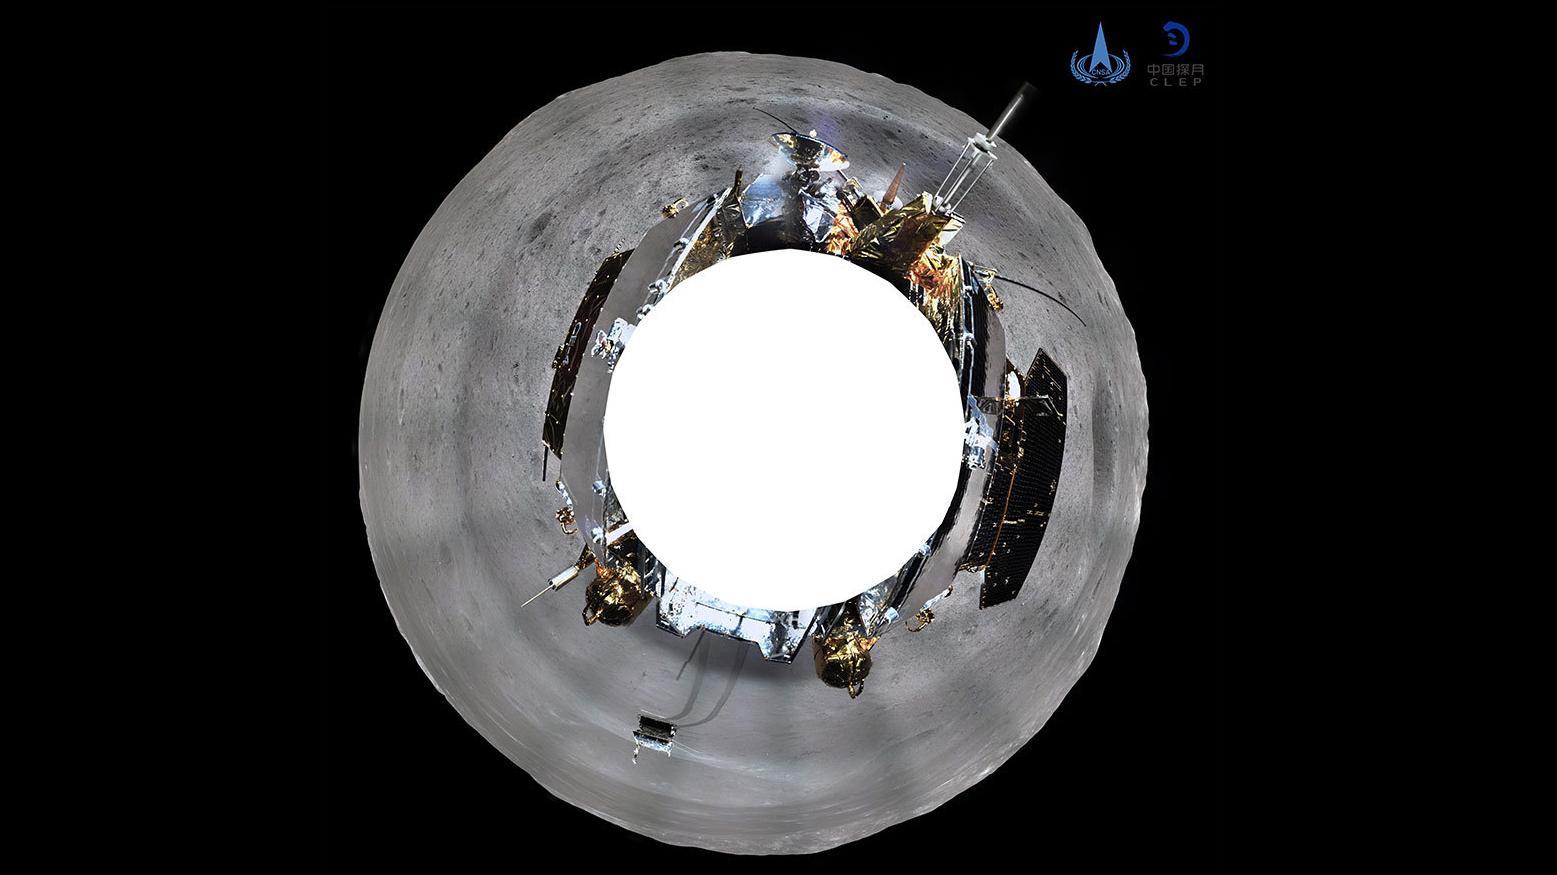 360-Grad-Rundblick der Kamera an Bord der chinesischen Mondsonde  Chang'e 4